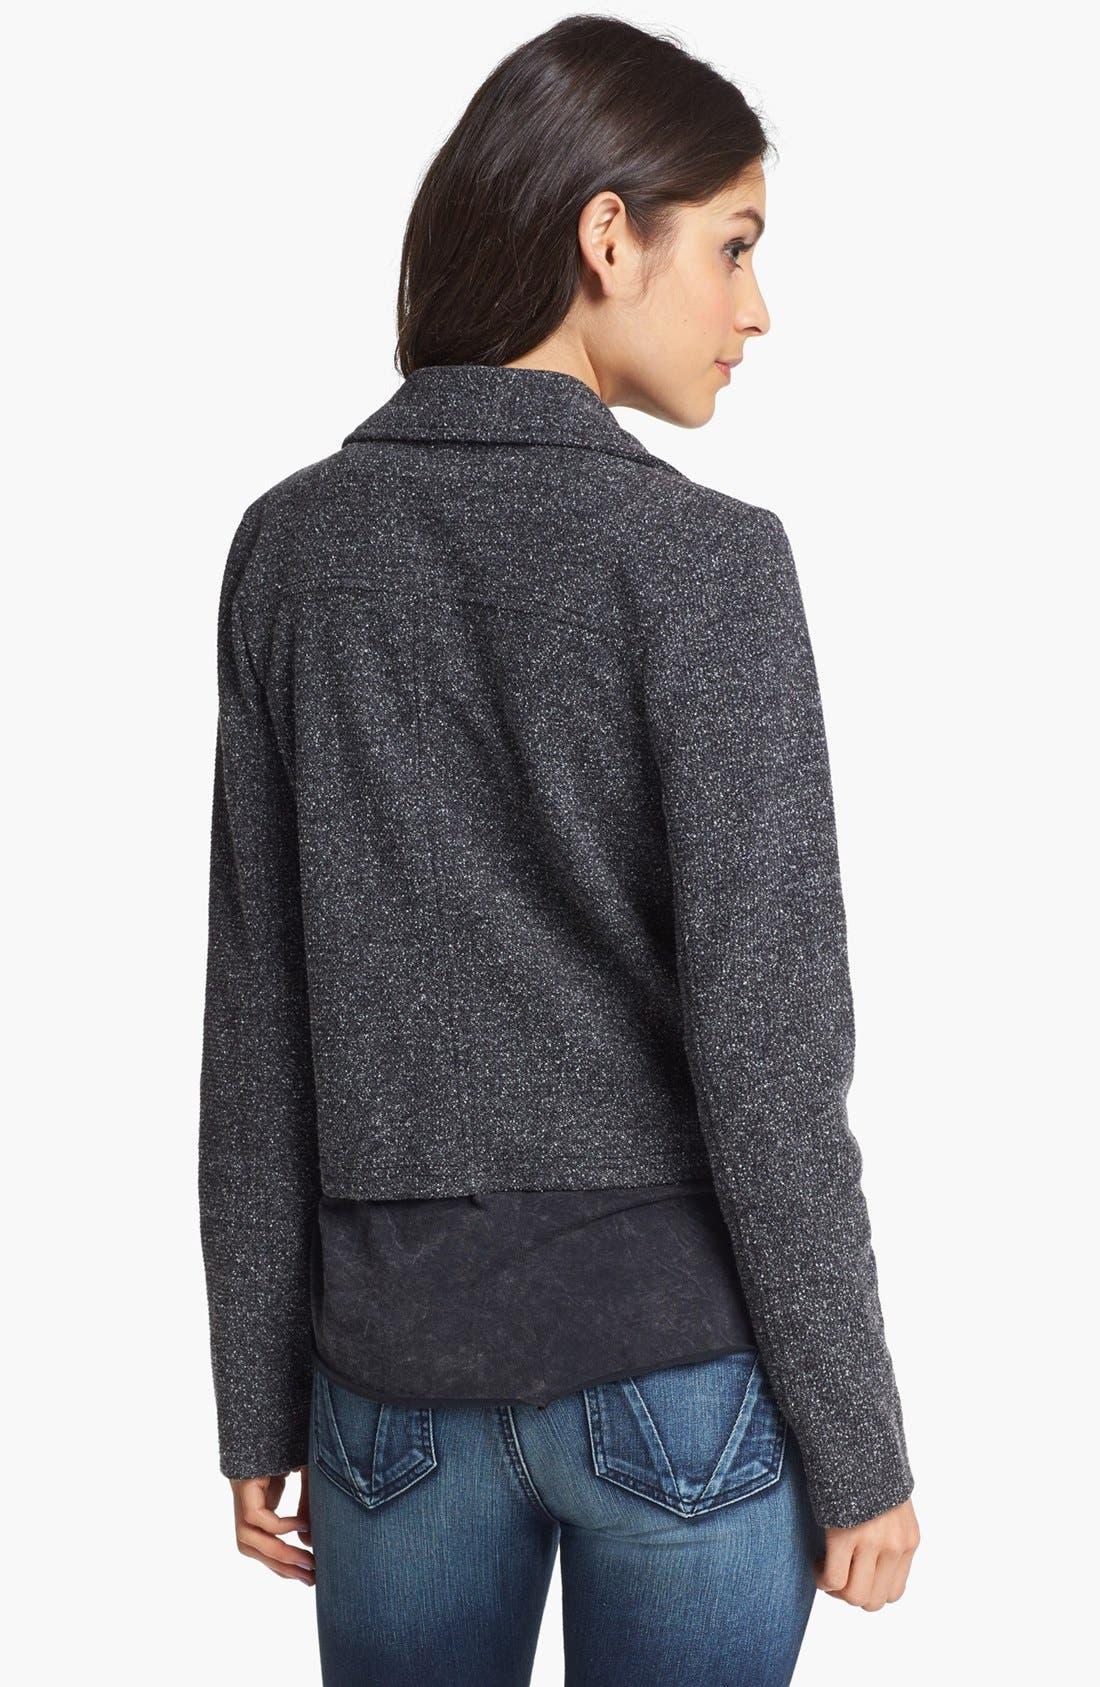 ORIGINAL FRENCHI,                             Faux Leather Lapel Tweed Moto Jacket,                             Alternate thumbnail 3, color,                             001